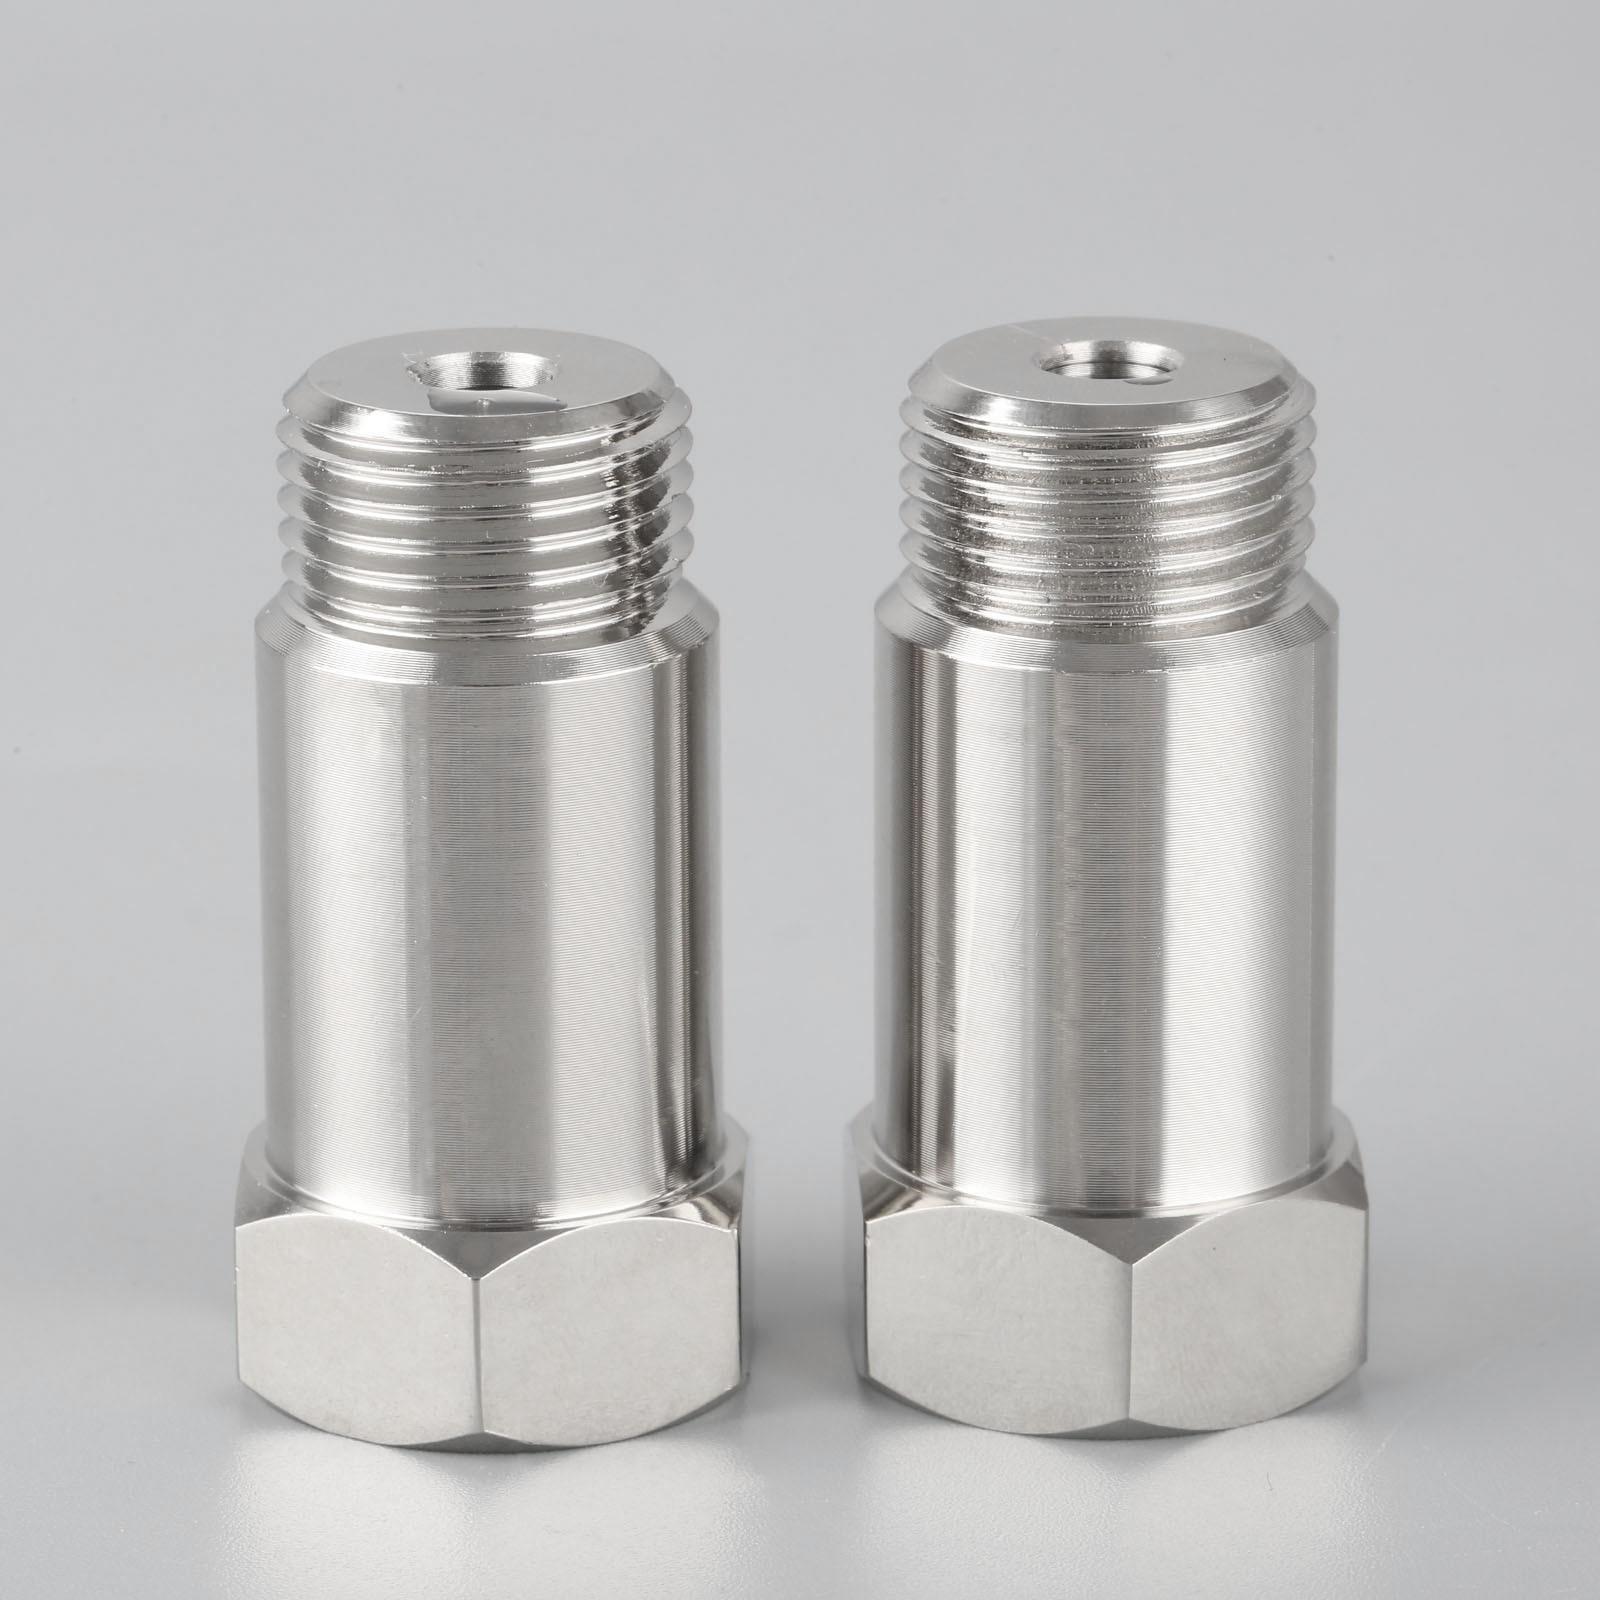 2Pcs Oxygen Sensor Lambda O2 45mm M18x1.5 Extension Extender Spacer Adapter Exhaust Steel and Zinced Oxygen Sensor Spacer